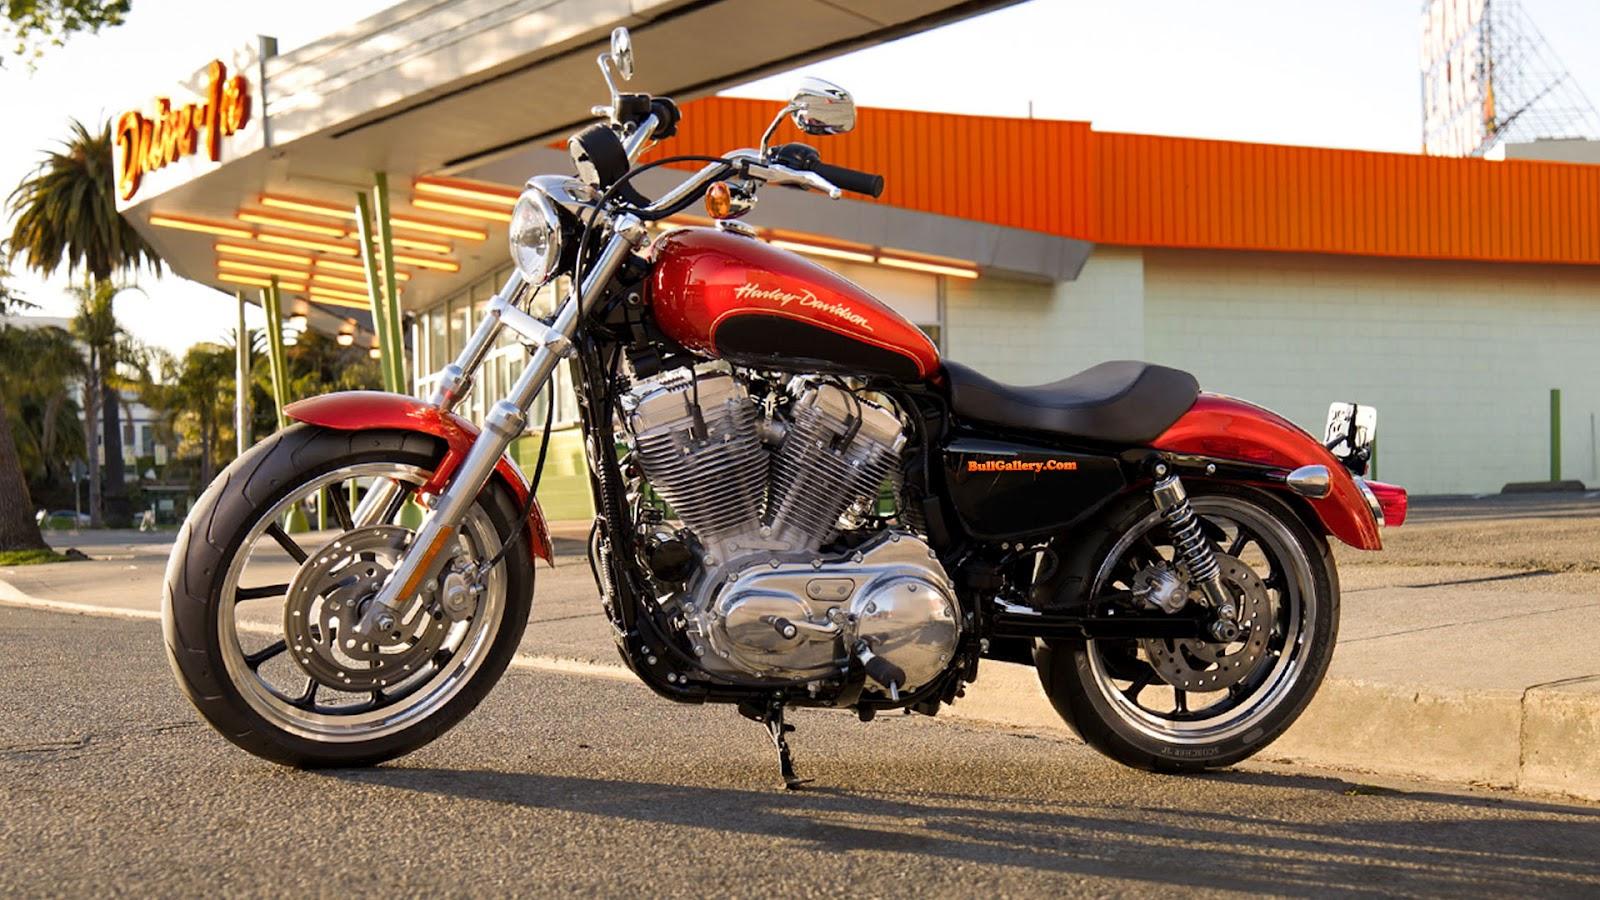 http://4.bp.blogspot.com/-vVSOBAiTVRY/UHBLSc-MR8I/AAAAAAAAAIs/UaKEMeoka4M/s1600/Harley-Davidson-XL883L-Sportster-883-SuperLow-Red-Wallpapers-BullGallery.Com.jpg